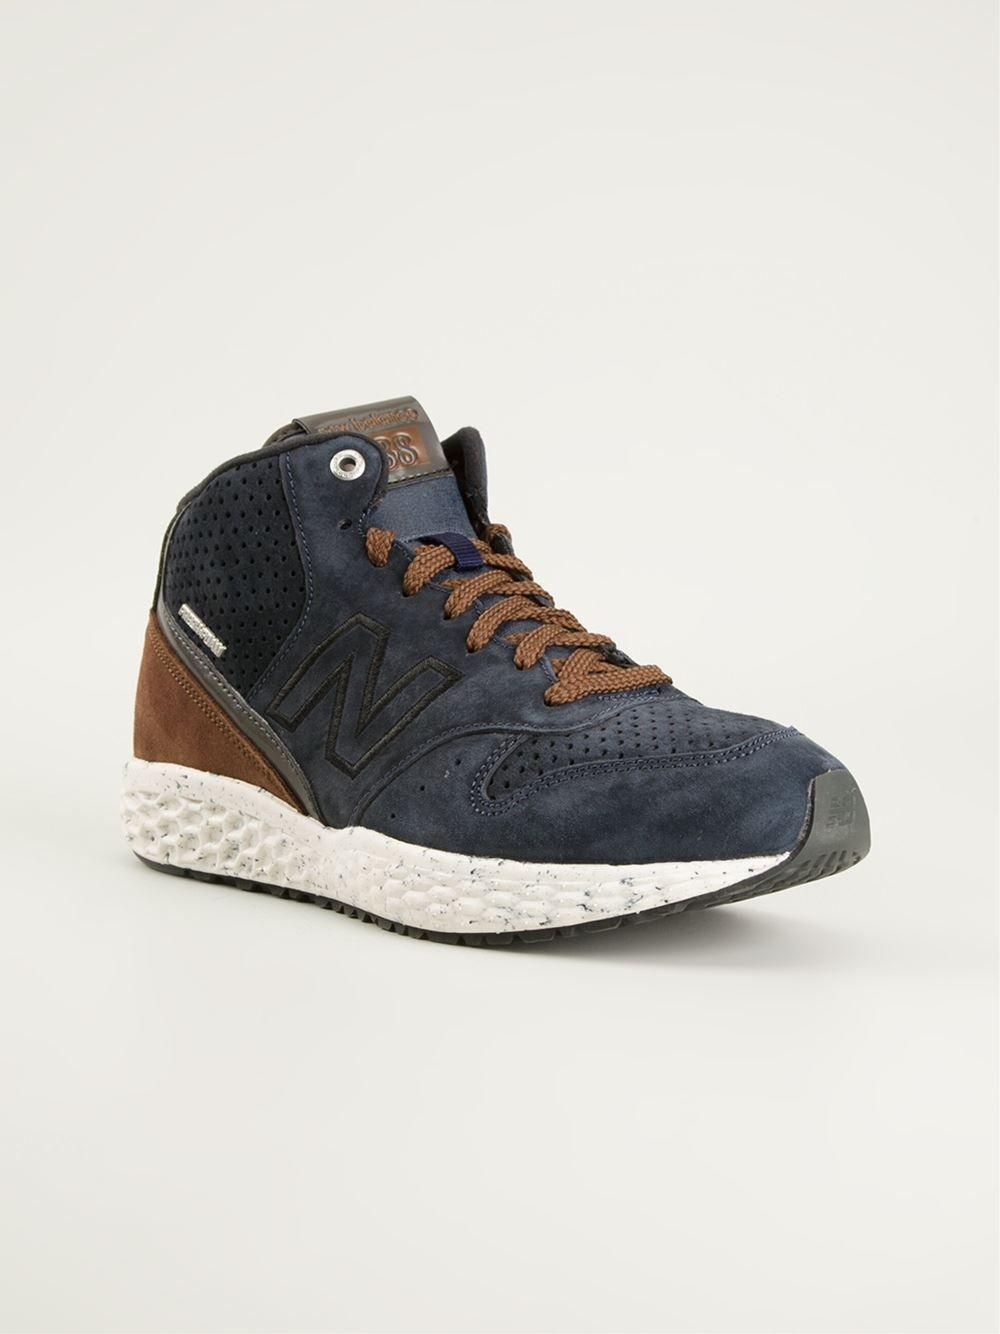 NEW BALANCE '988' hi-top sneakers